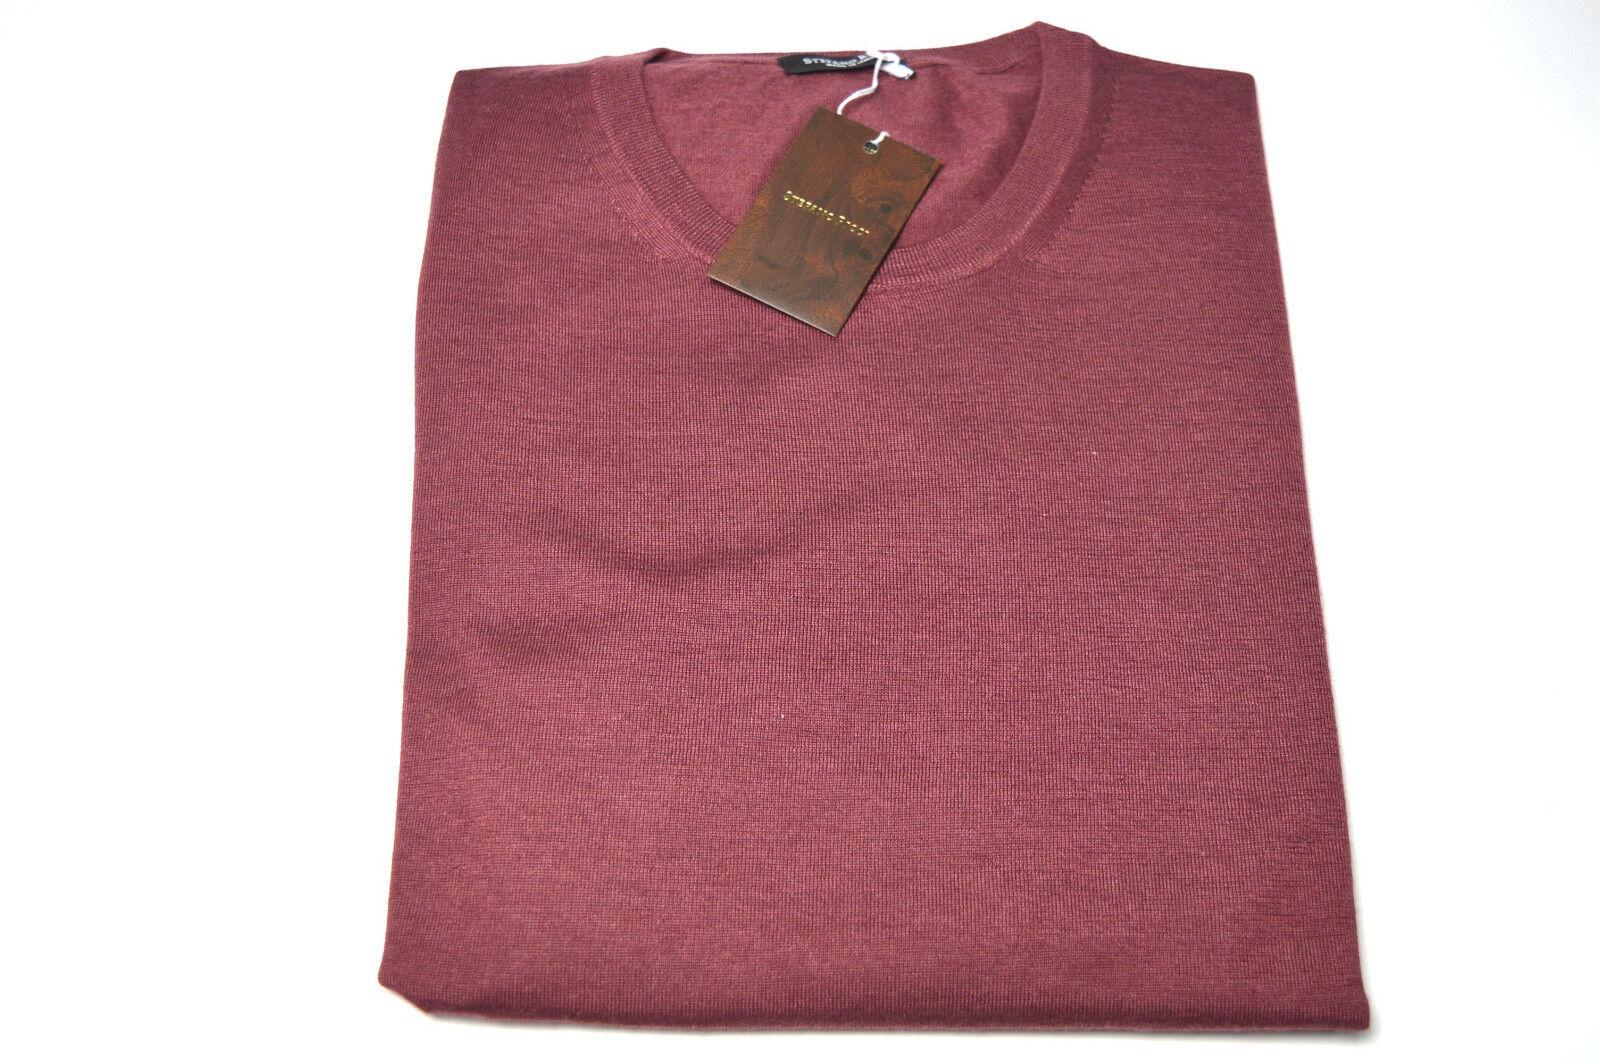 NEW  1740,00 STEFANO RICCI Sweater  Cashmere  Größe 5XL Us 62 Eu (COD AF21)